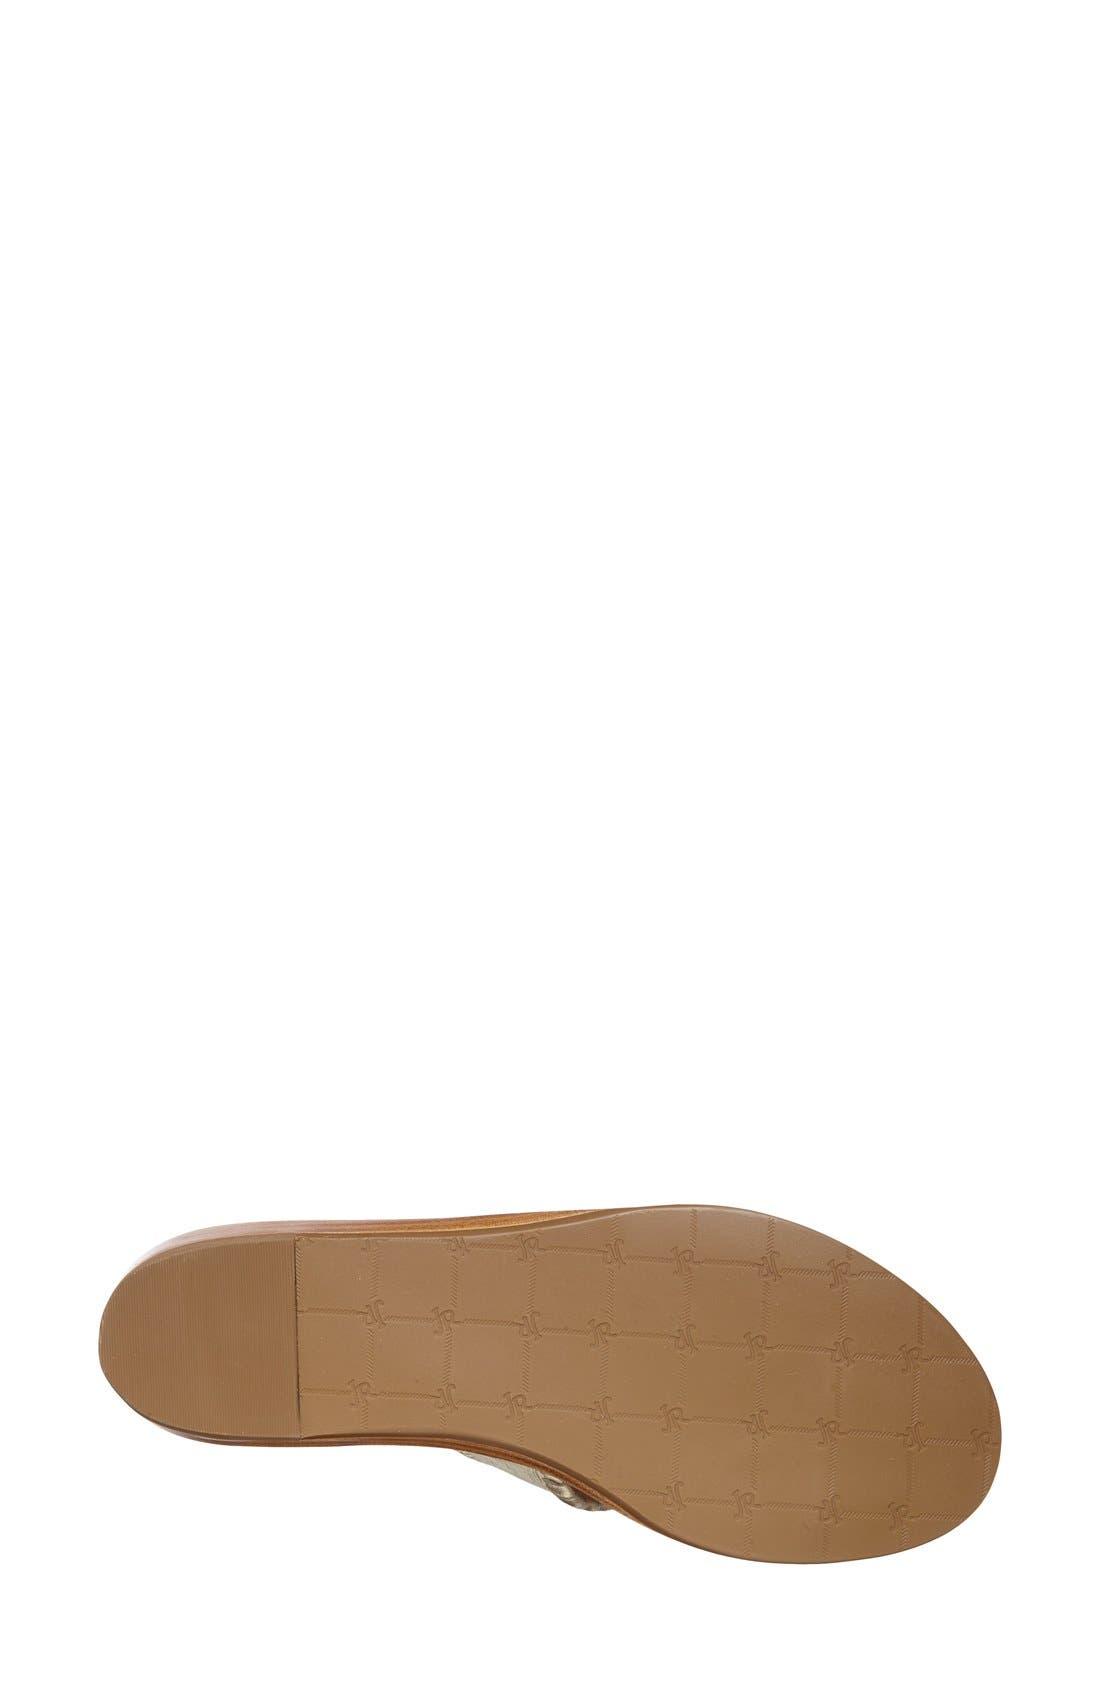 'Capri' Etched Sandal,                             Alternate thumbnail 2, color,                             042